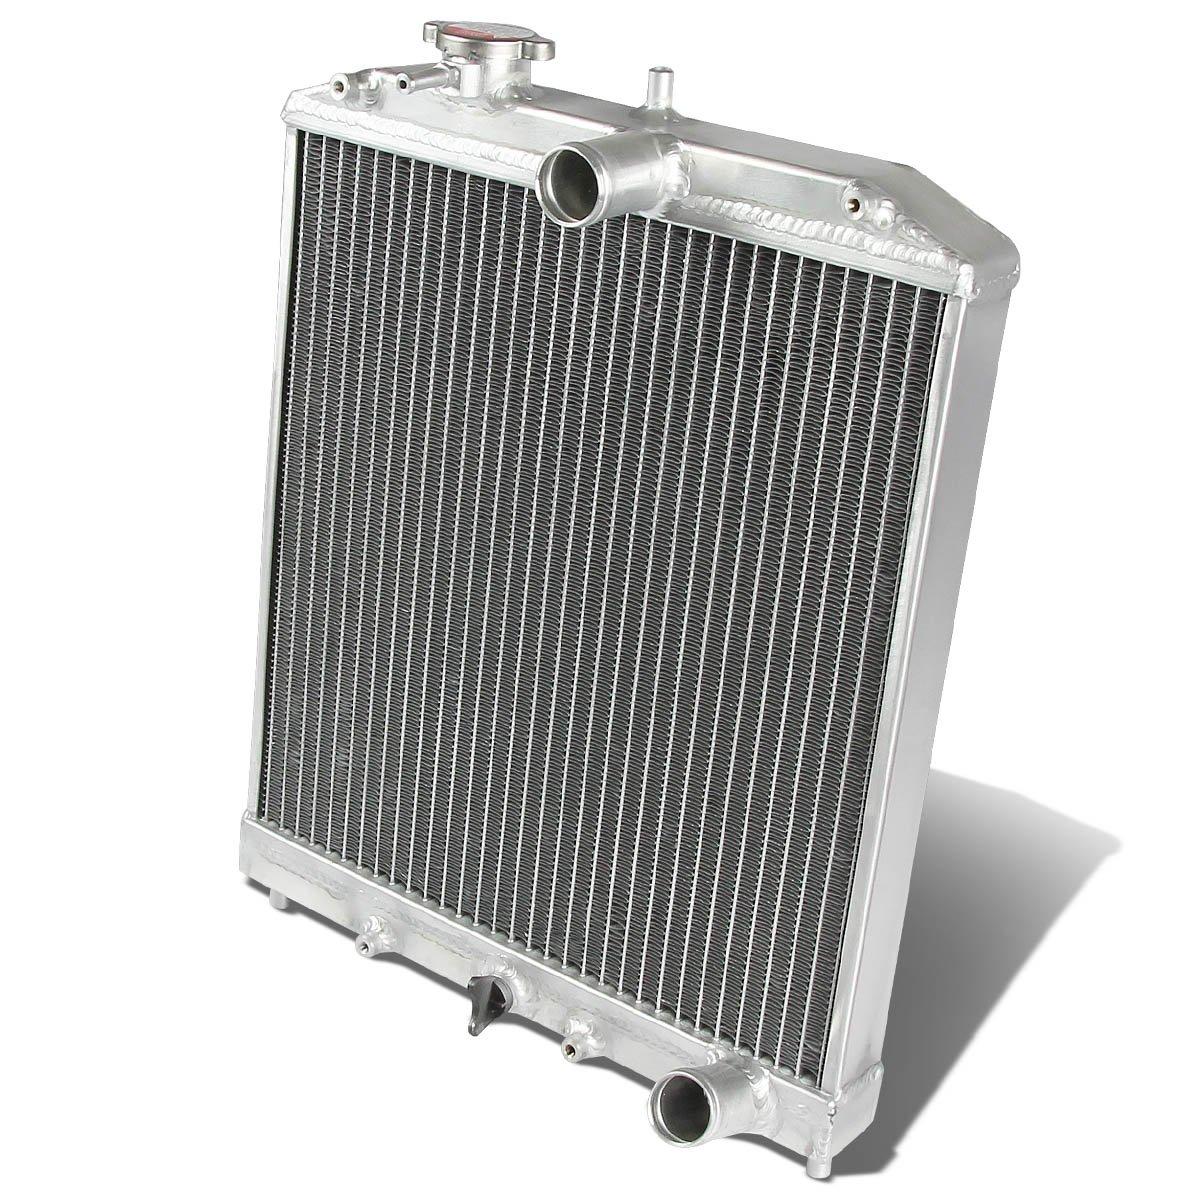 DNA MOTORING RA-HC92-42-2 Honda D15/16/B18 1.5L/1.6L/1.8L I4 Mt 2-Row Dual/Double Core T-6061 Aluminum Radiator